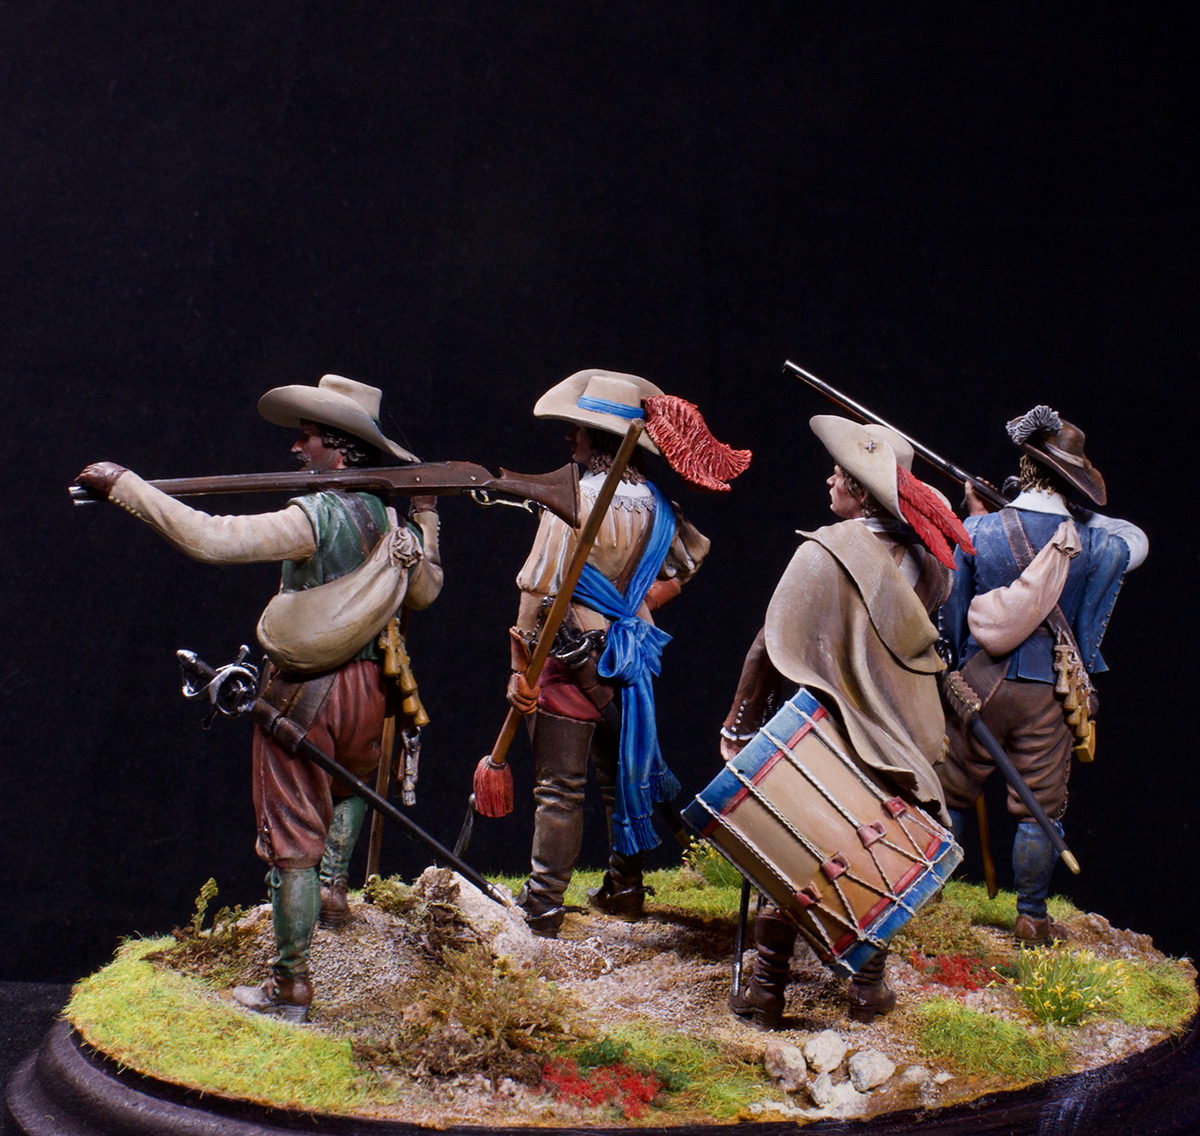 Фигурки: Мушкетеры, барабанщик и офицер, 1630 г. , фото #9